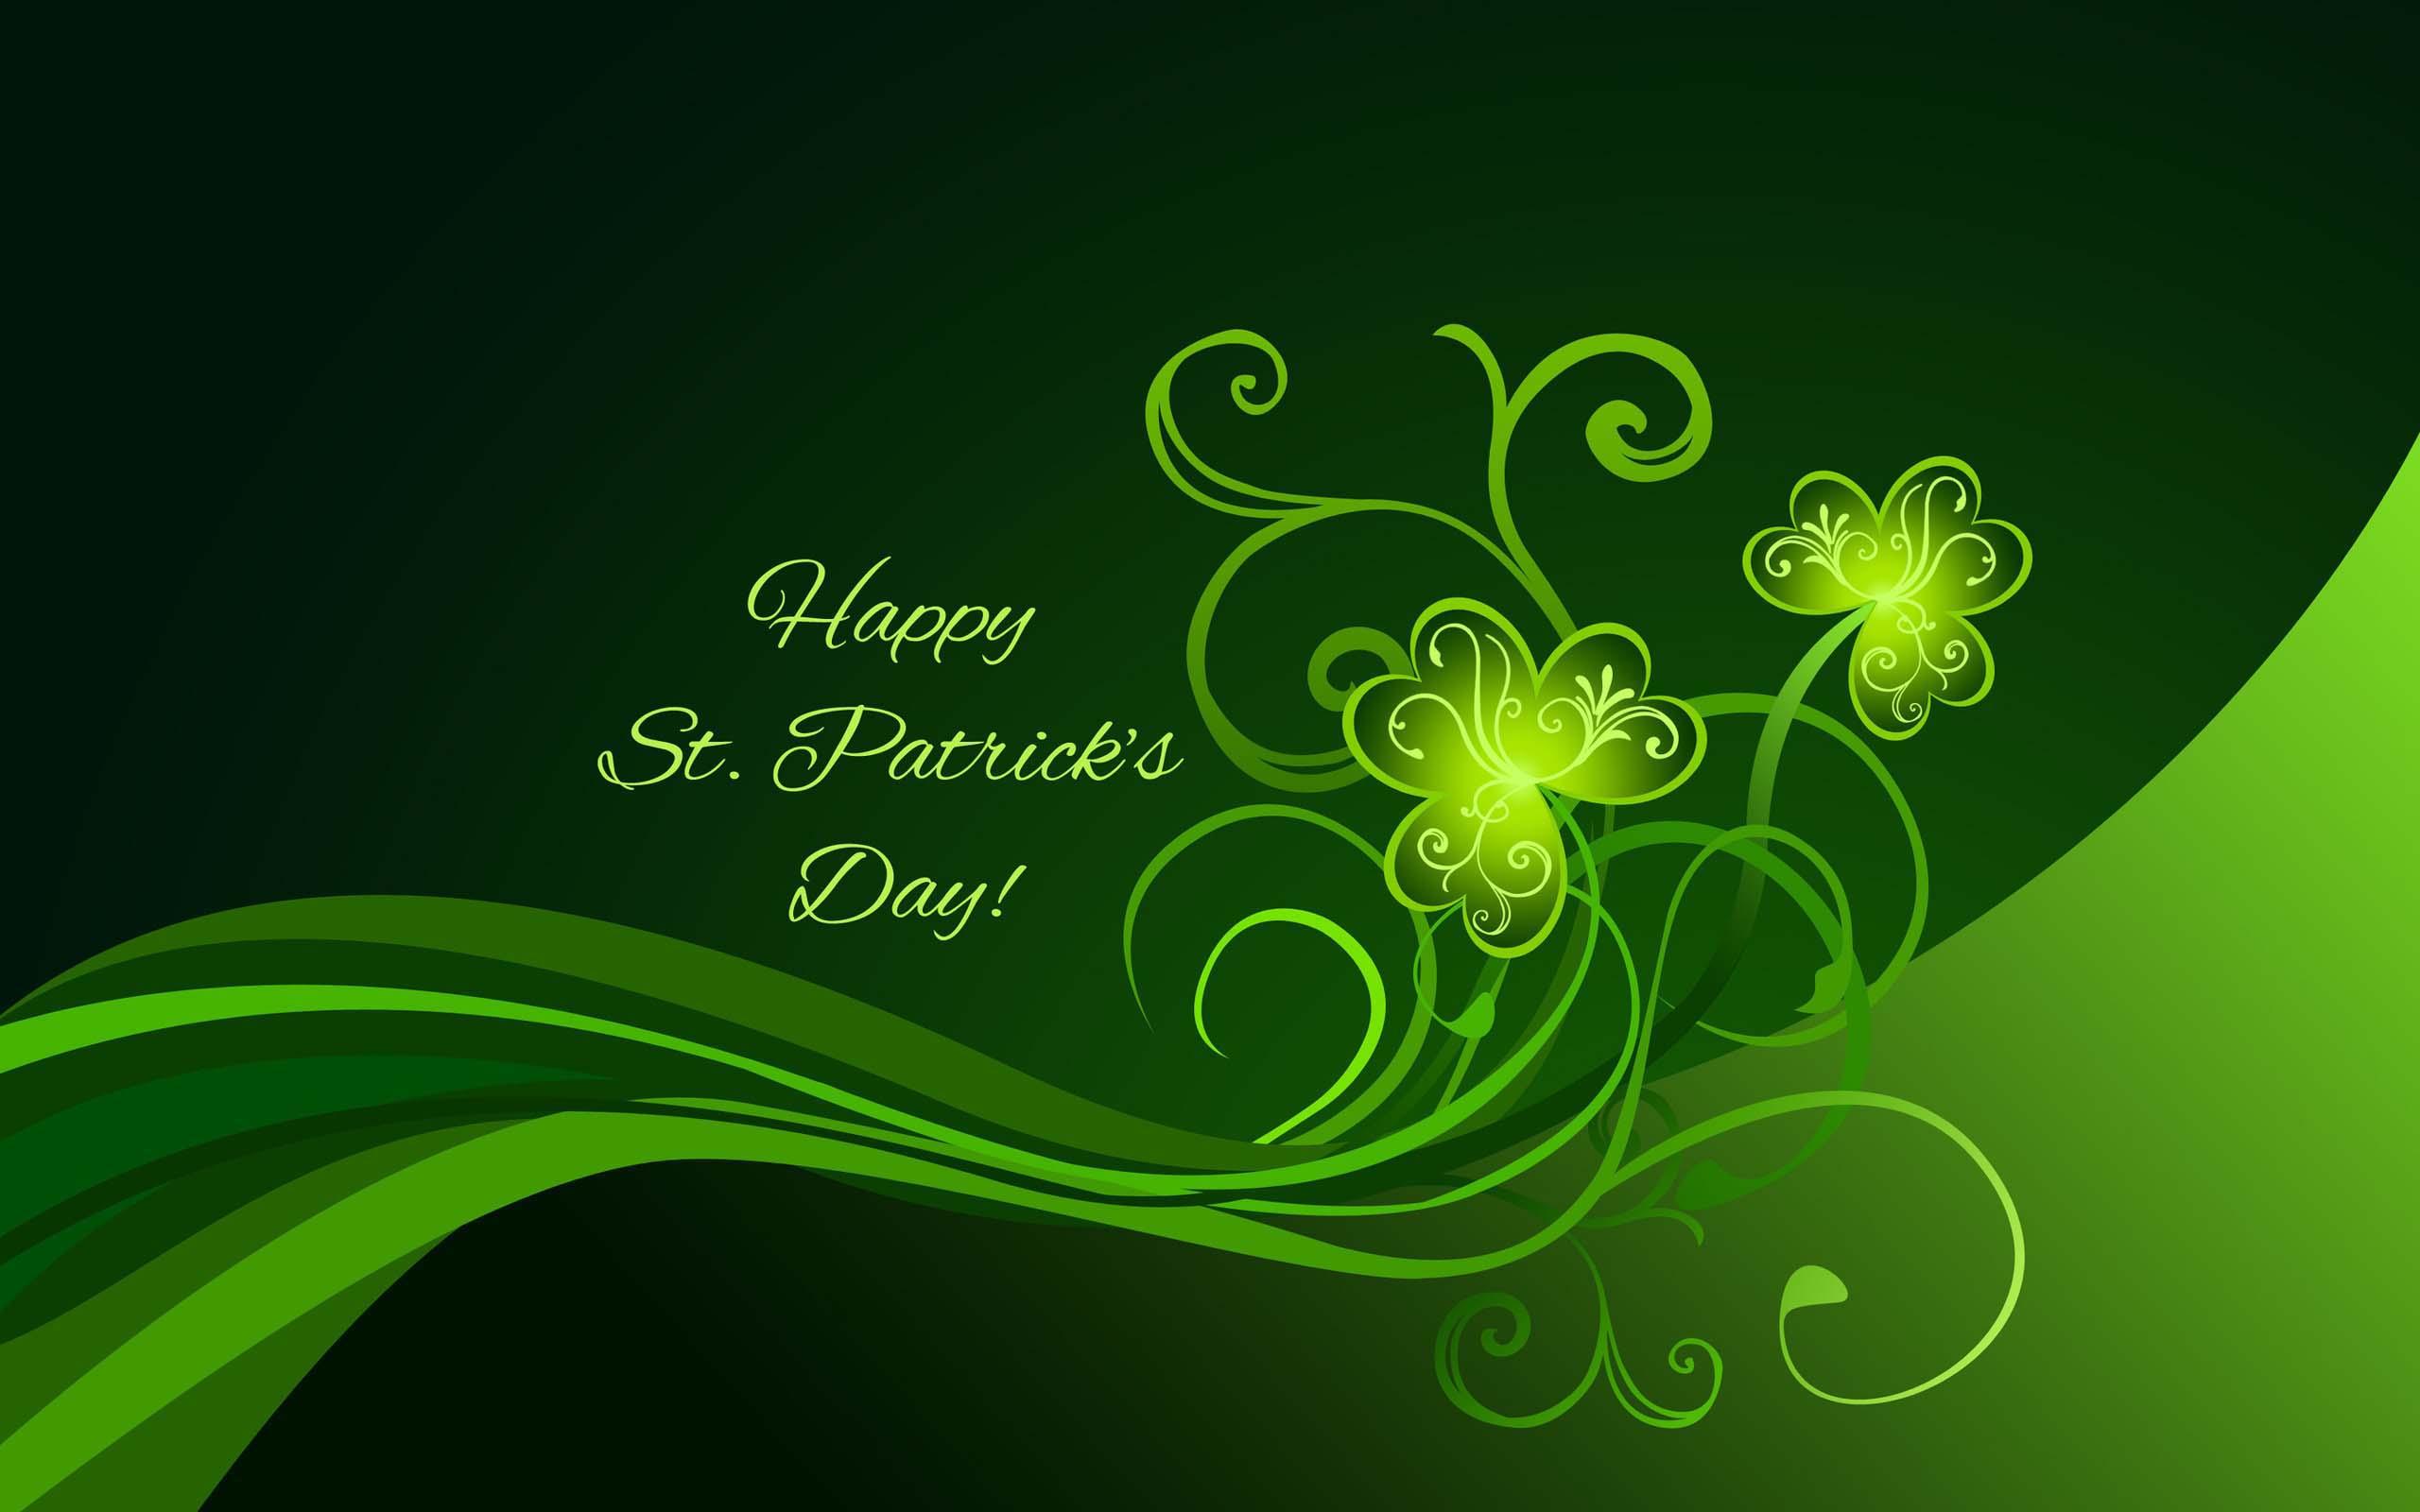 Happy St Patricks Day PC Wallpaper 2880x1800   Cool PC 2560x1600